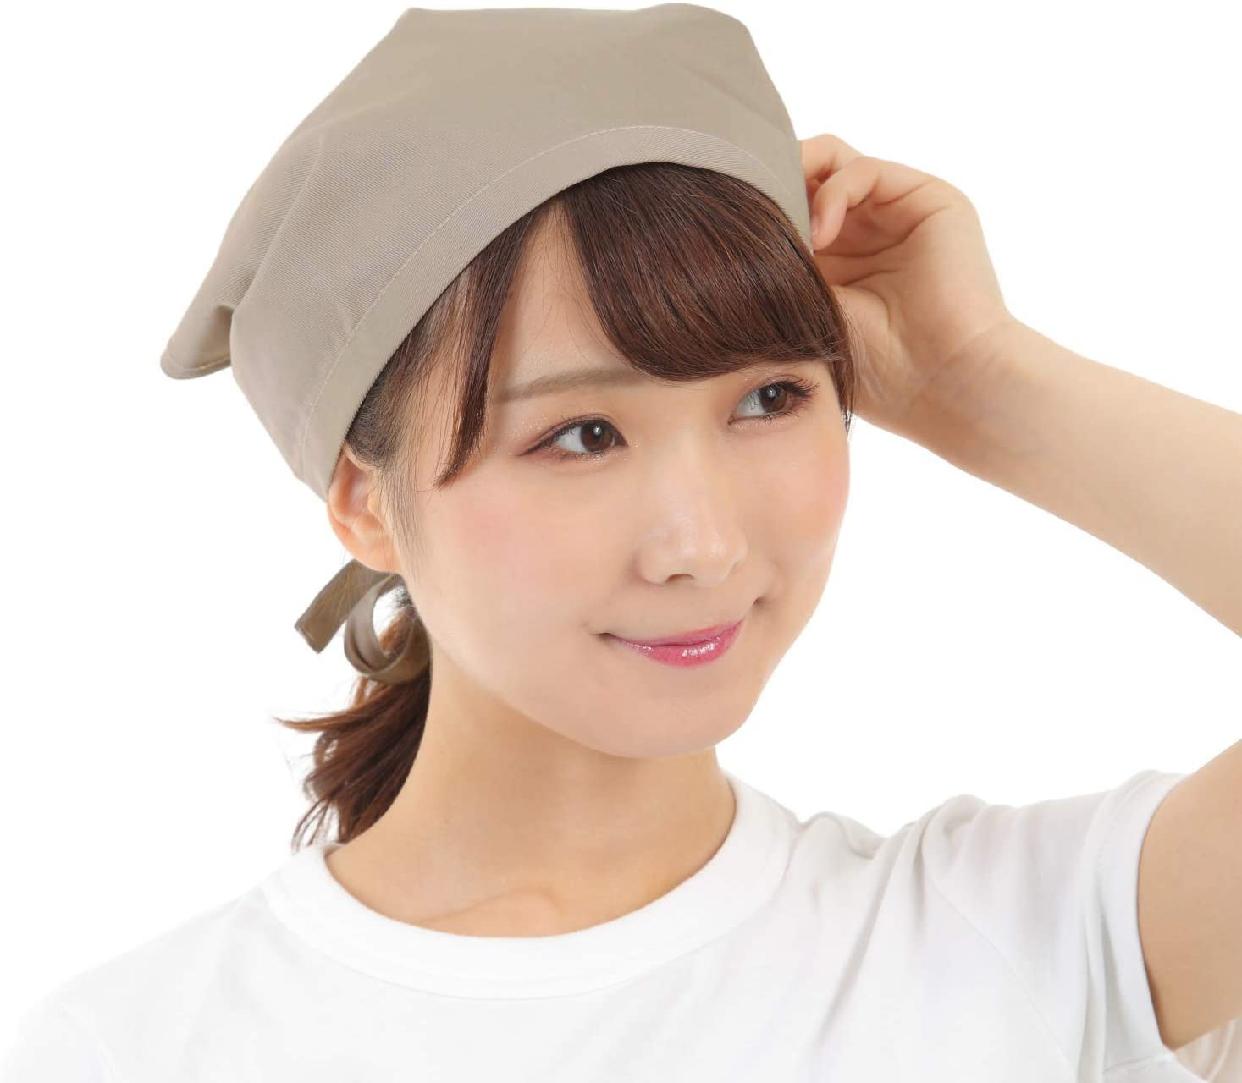 smile mode(スマイル モード) 三角巾の商品画像